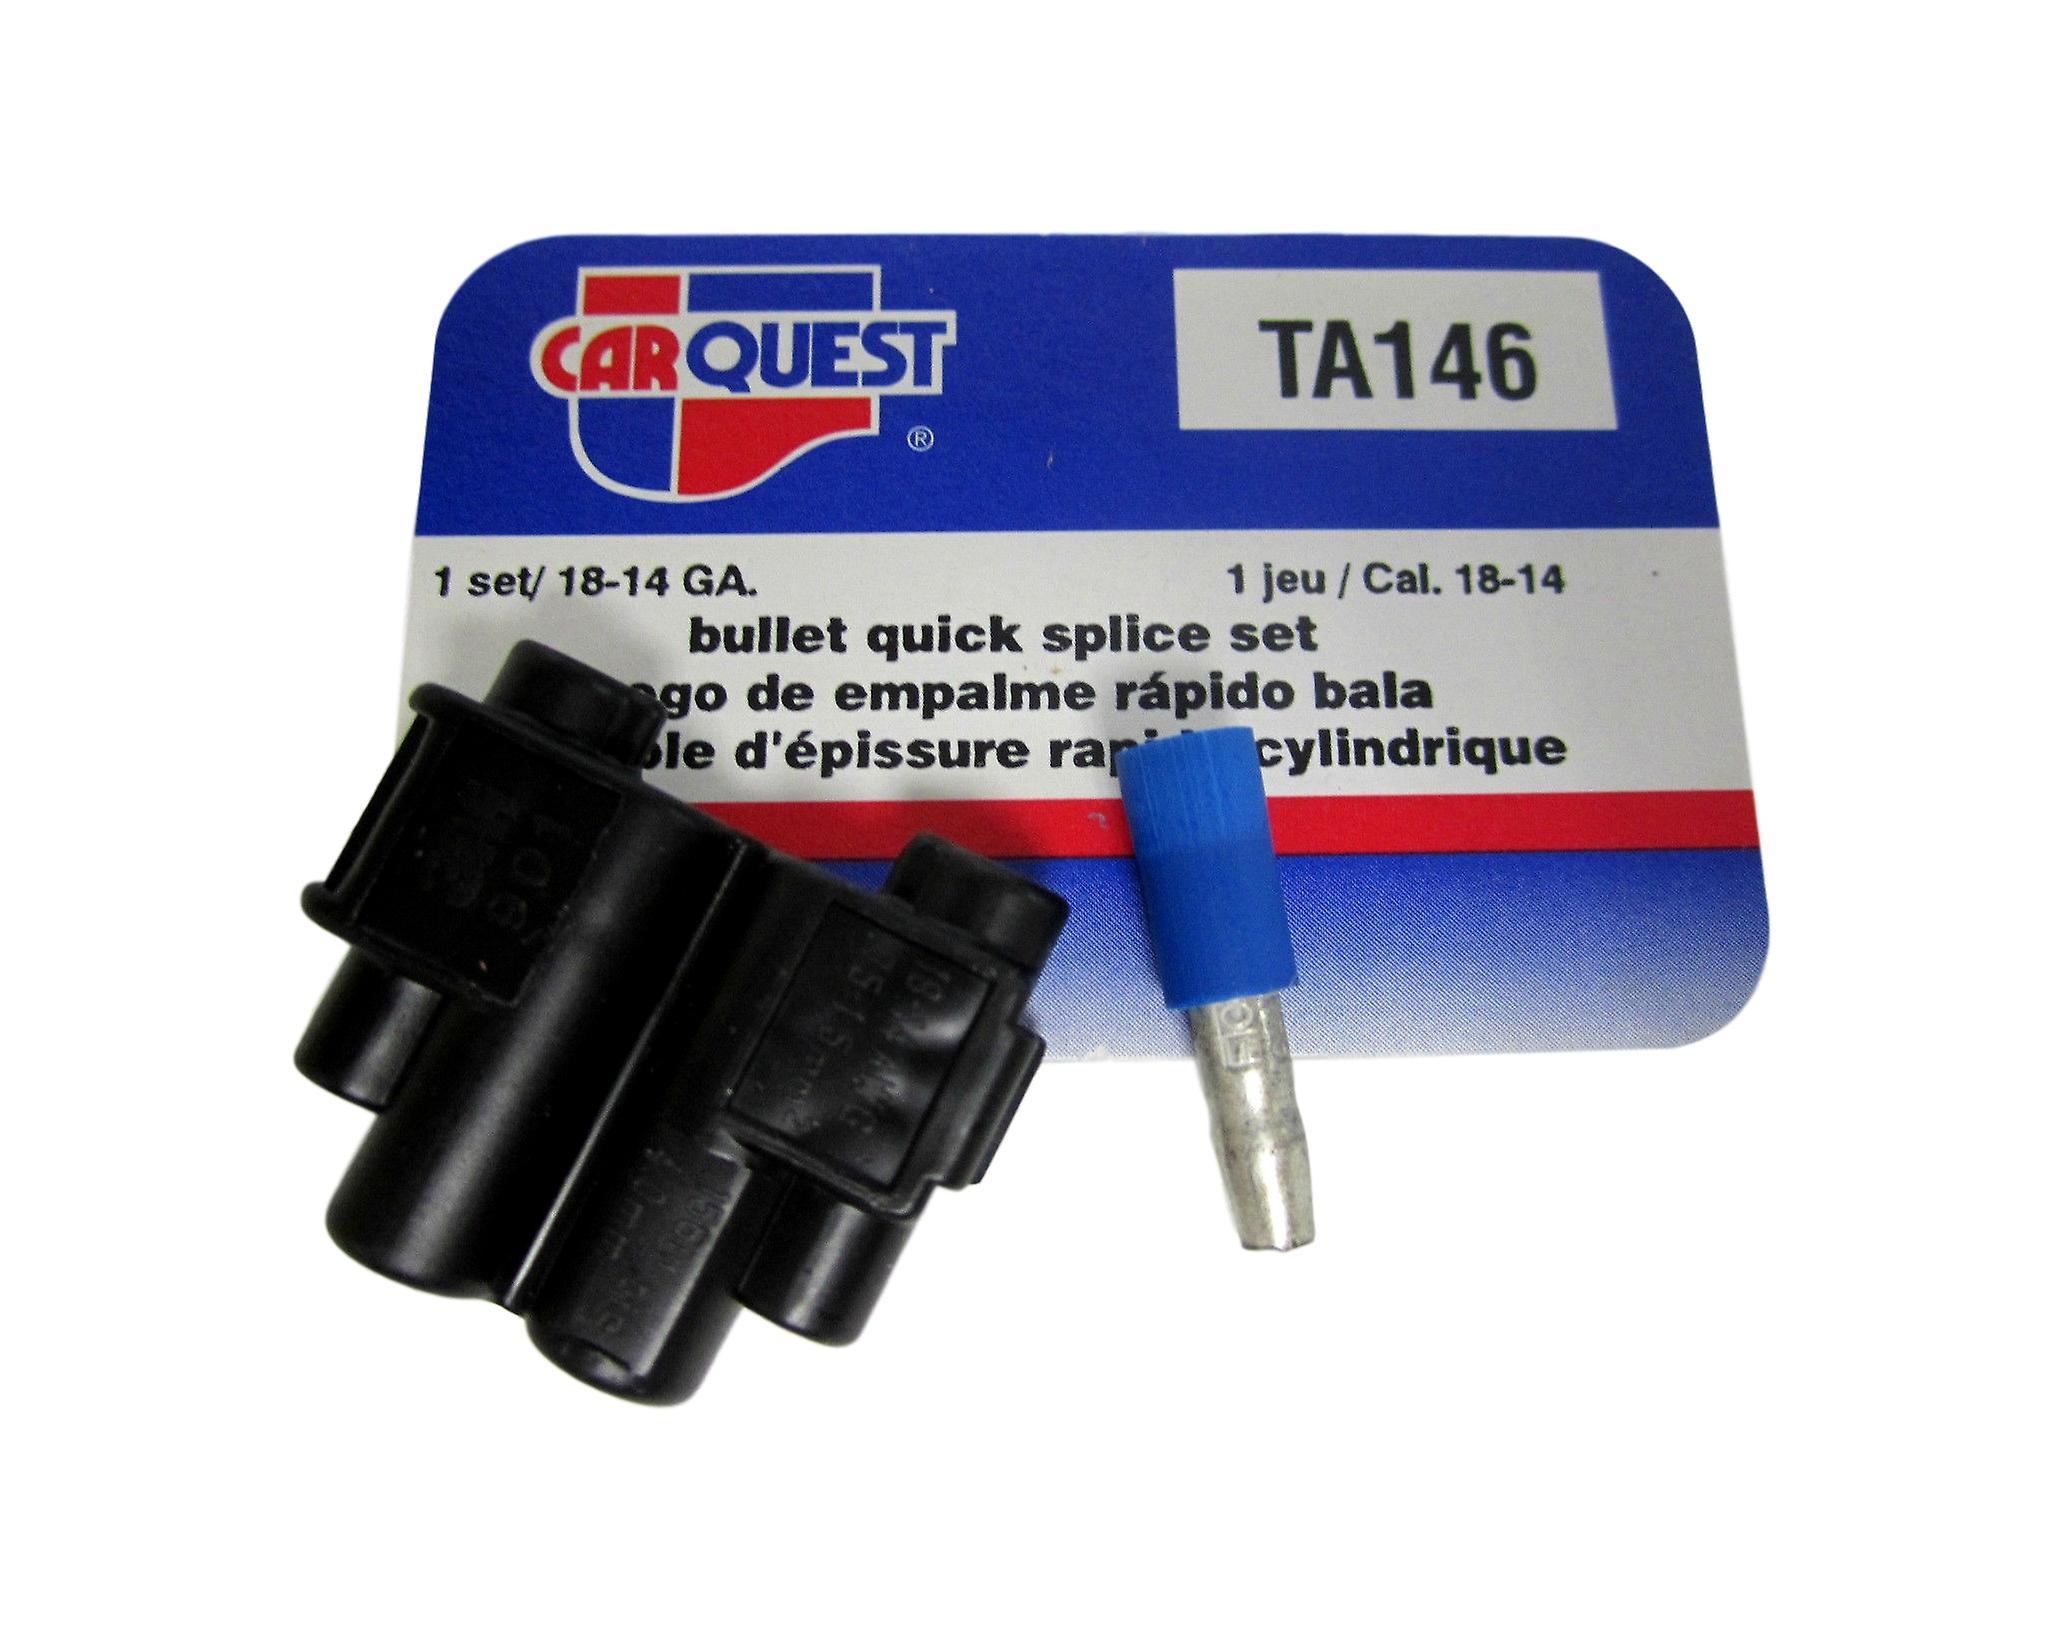 Carquest TA146 TA146 18-14 калибровочных пуля Быстрая Splice набор